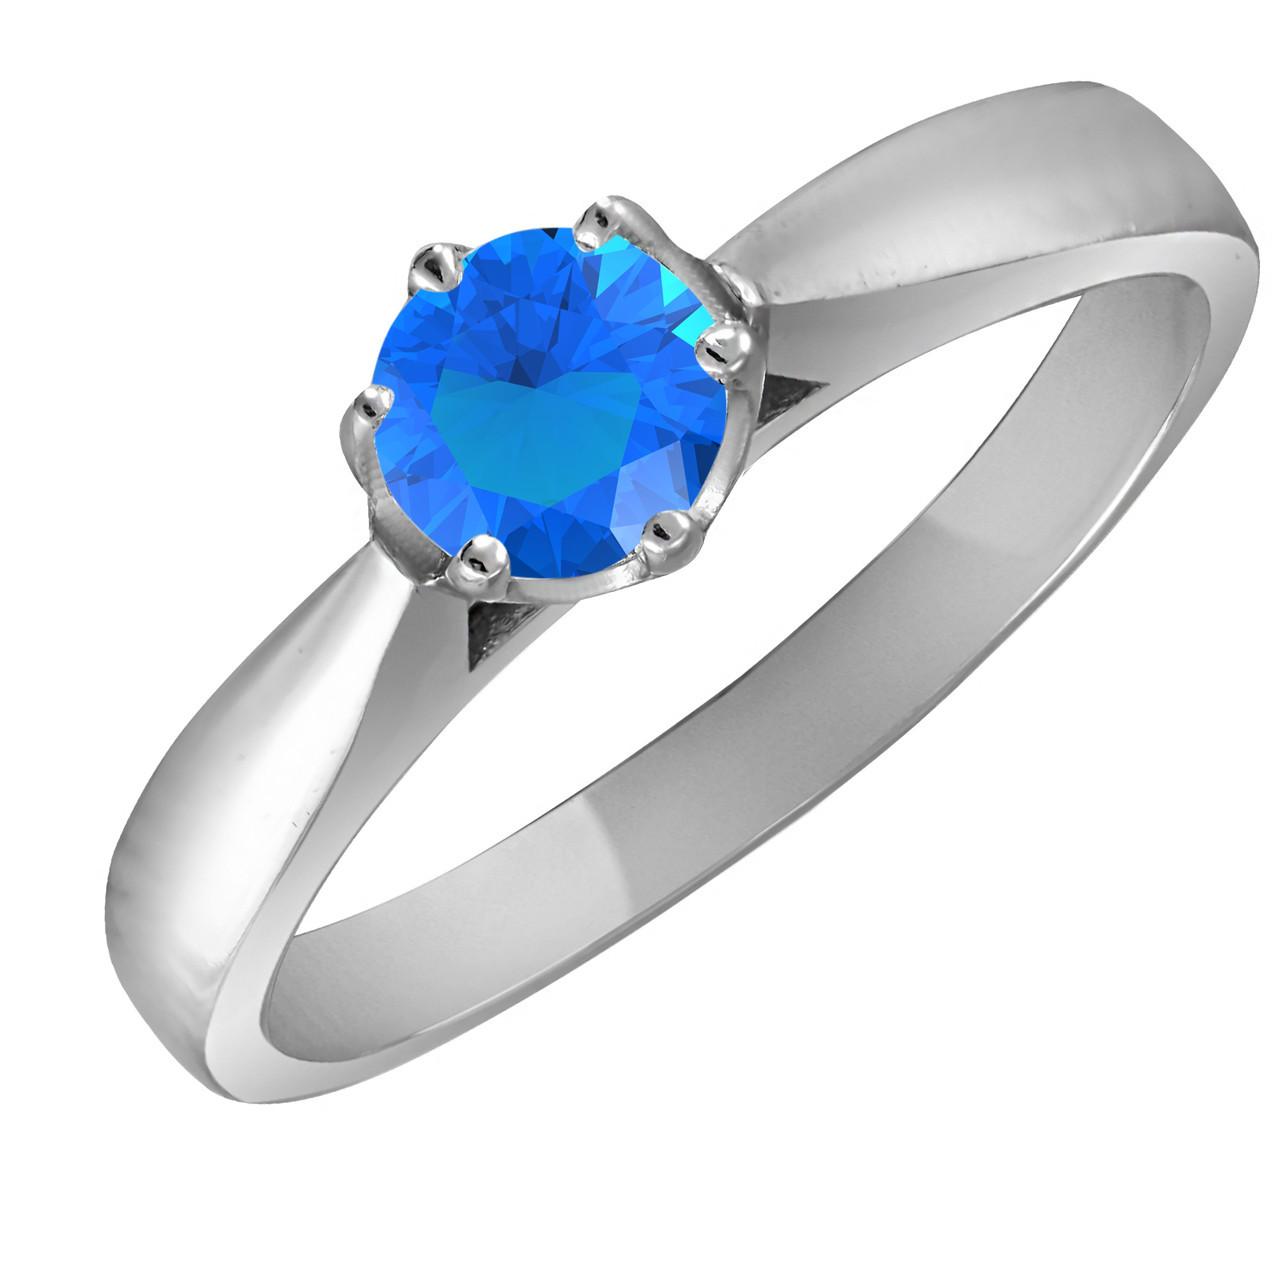 Кольцо из серебра с голубым кубическим цирконием Twiddle Jewelry 19.5 размер (К015г-19.5)